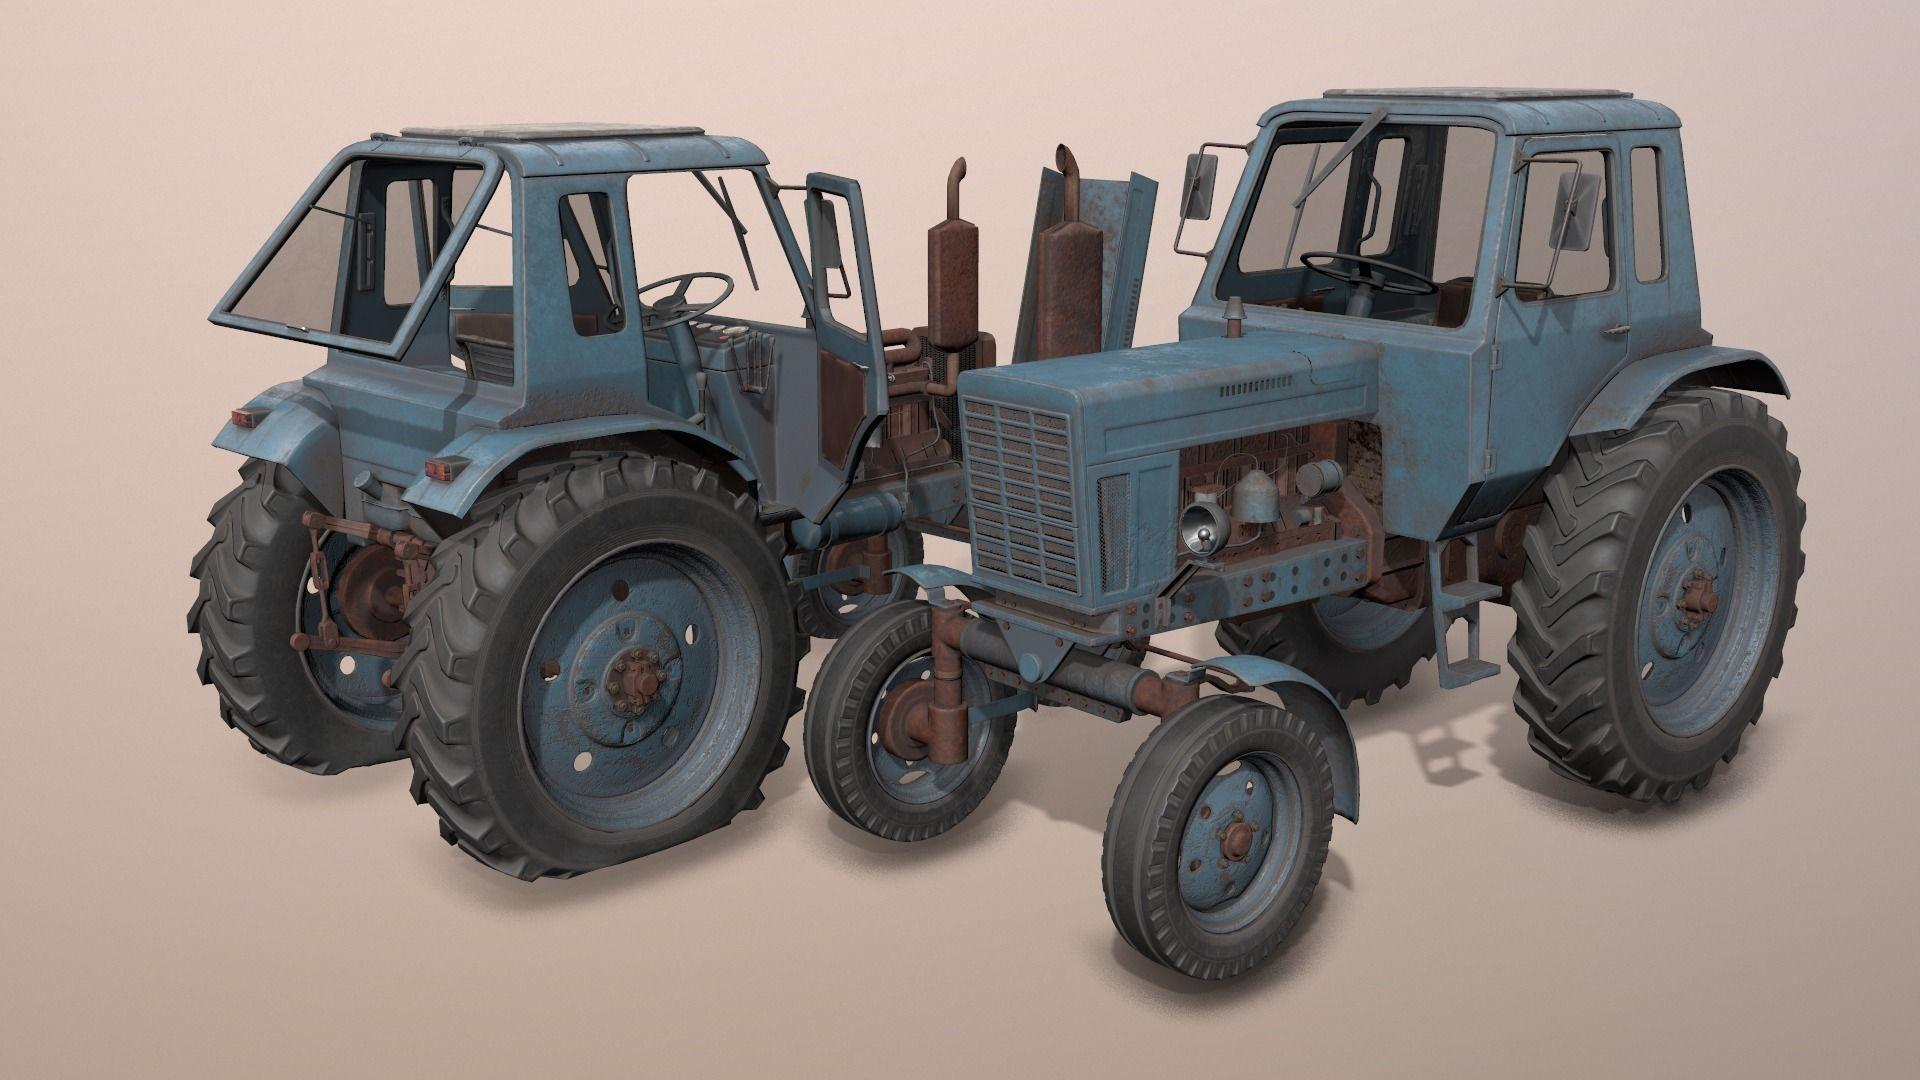 MTZ-80 tractor